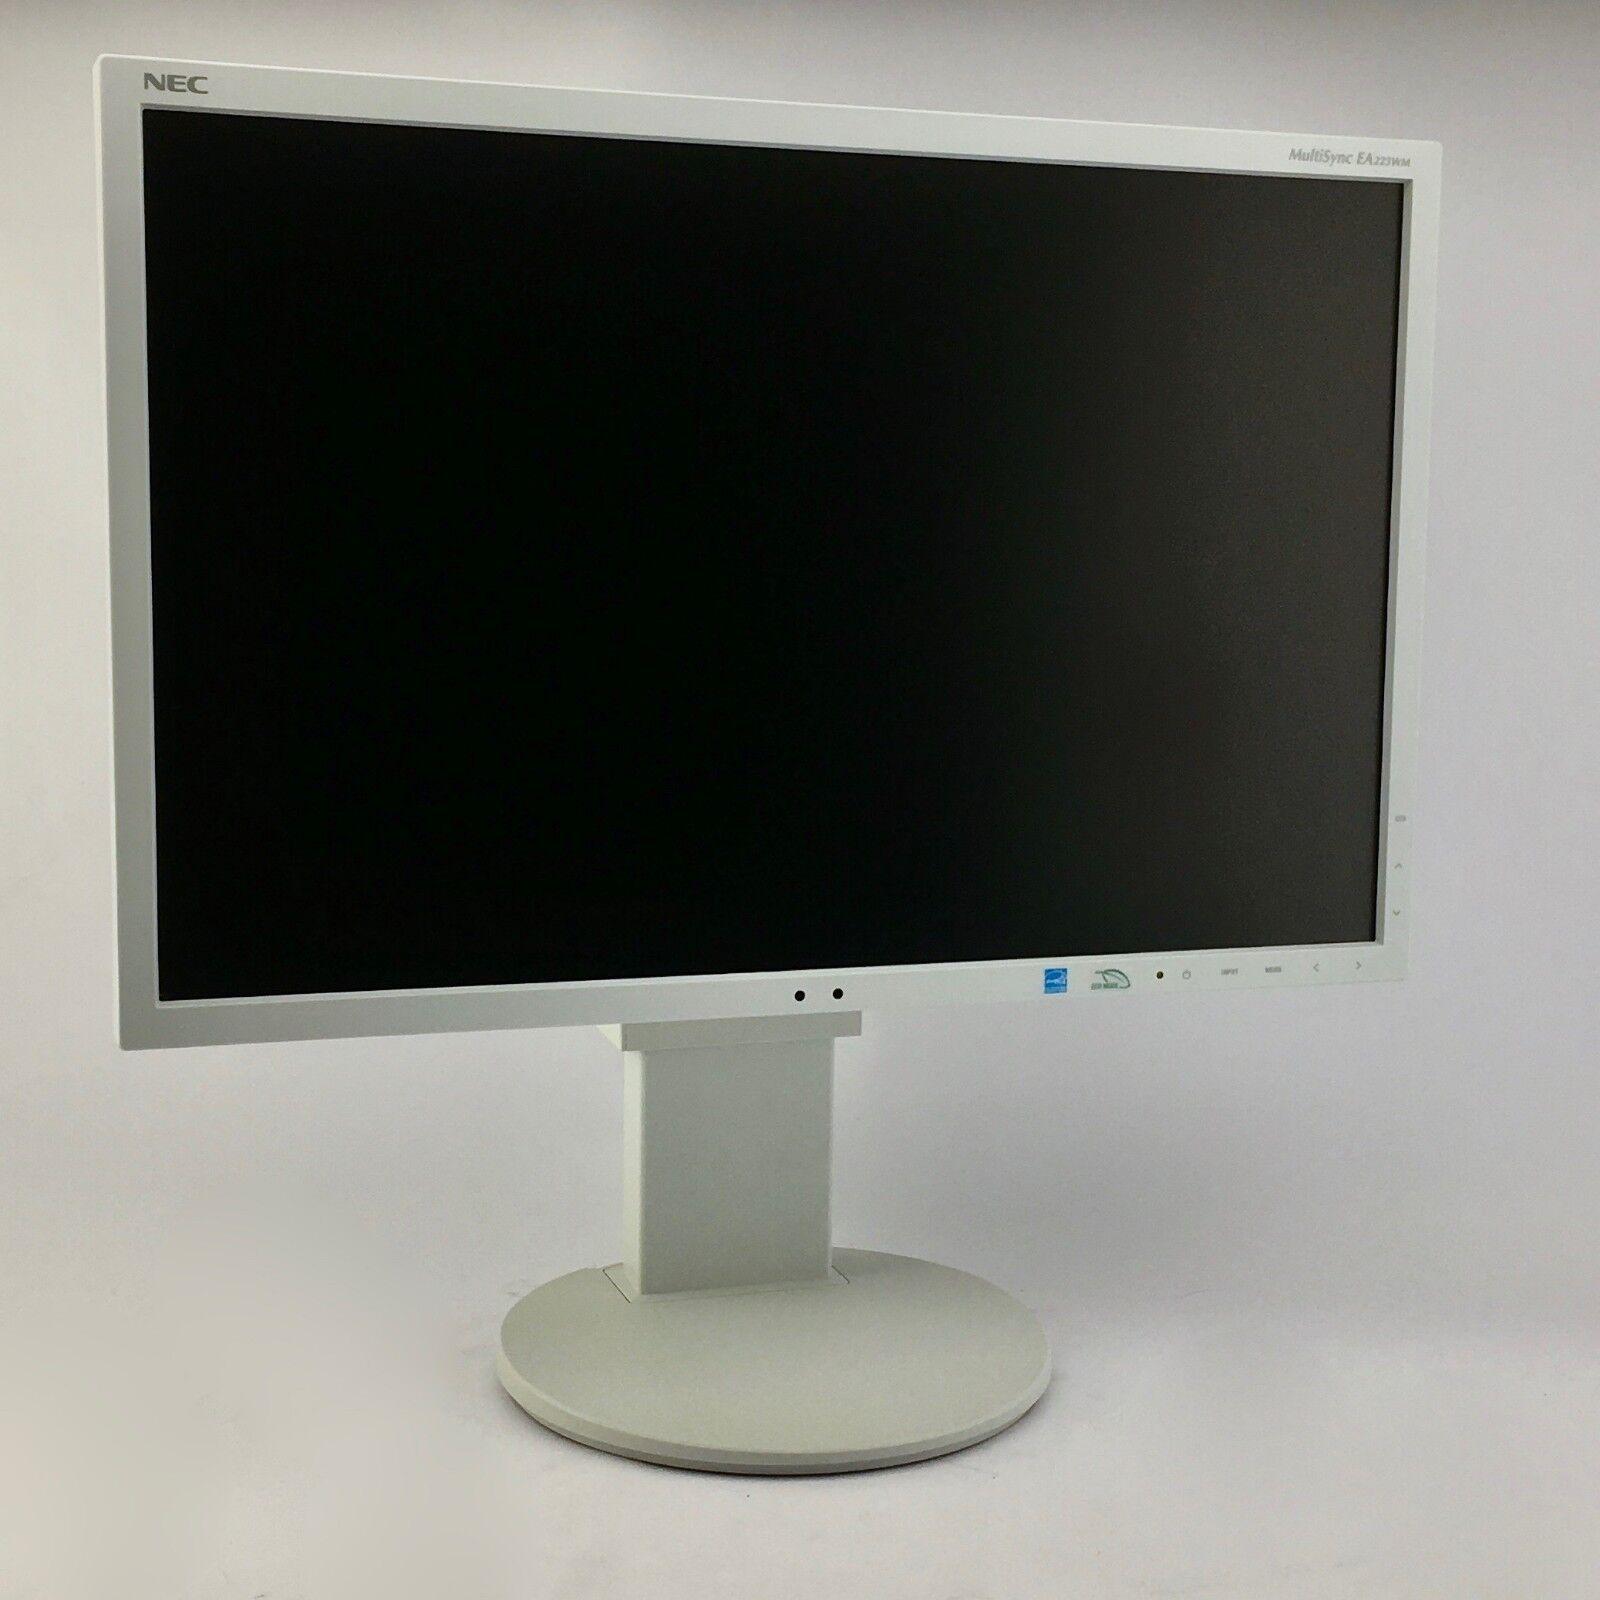 22 Zoll Monitor, NEC EA223WM, DVI, VGA, DP, 1680 x 1050, TN Panel, Audio, B